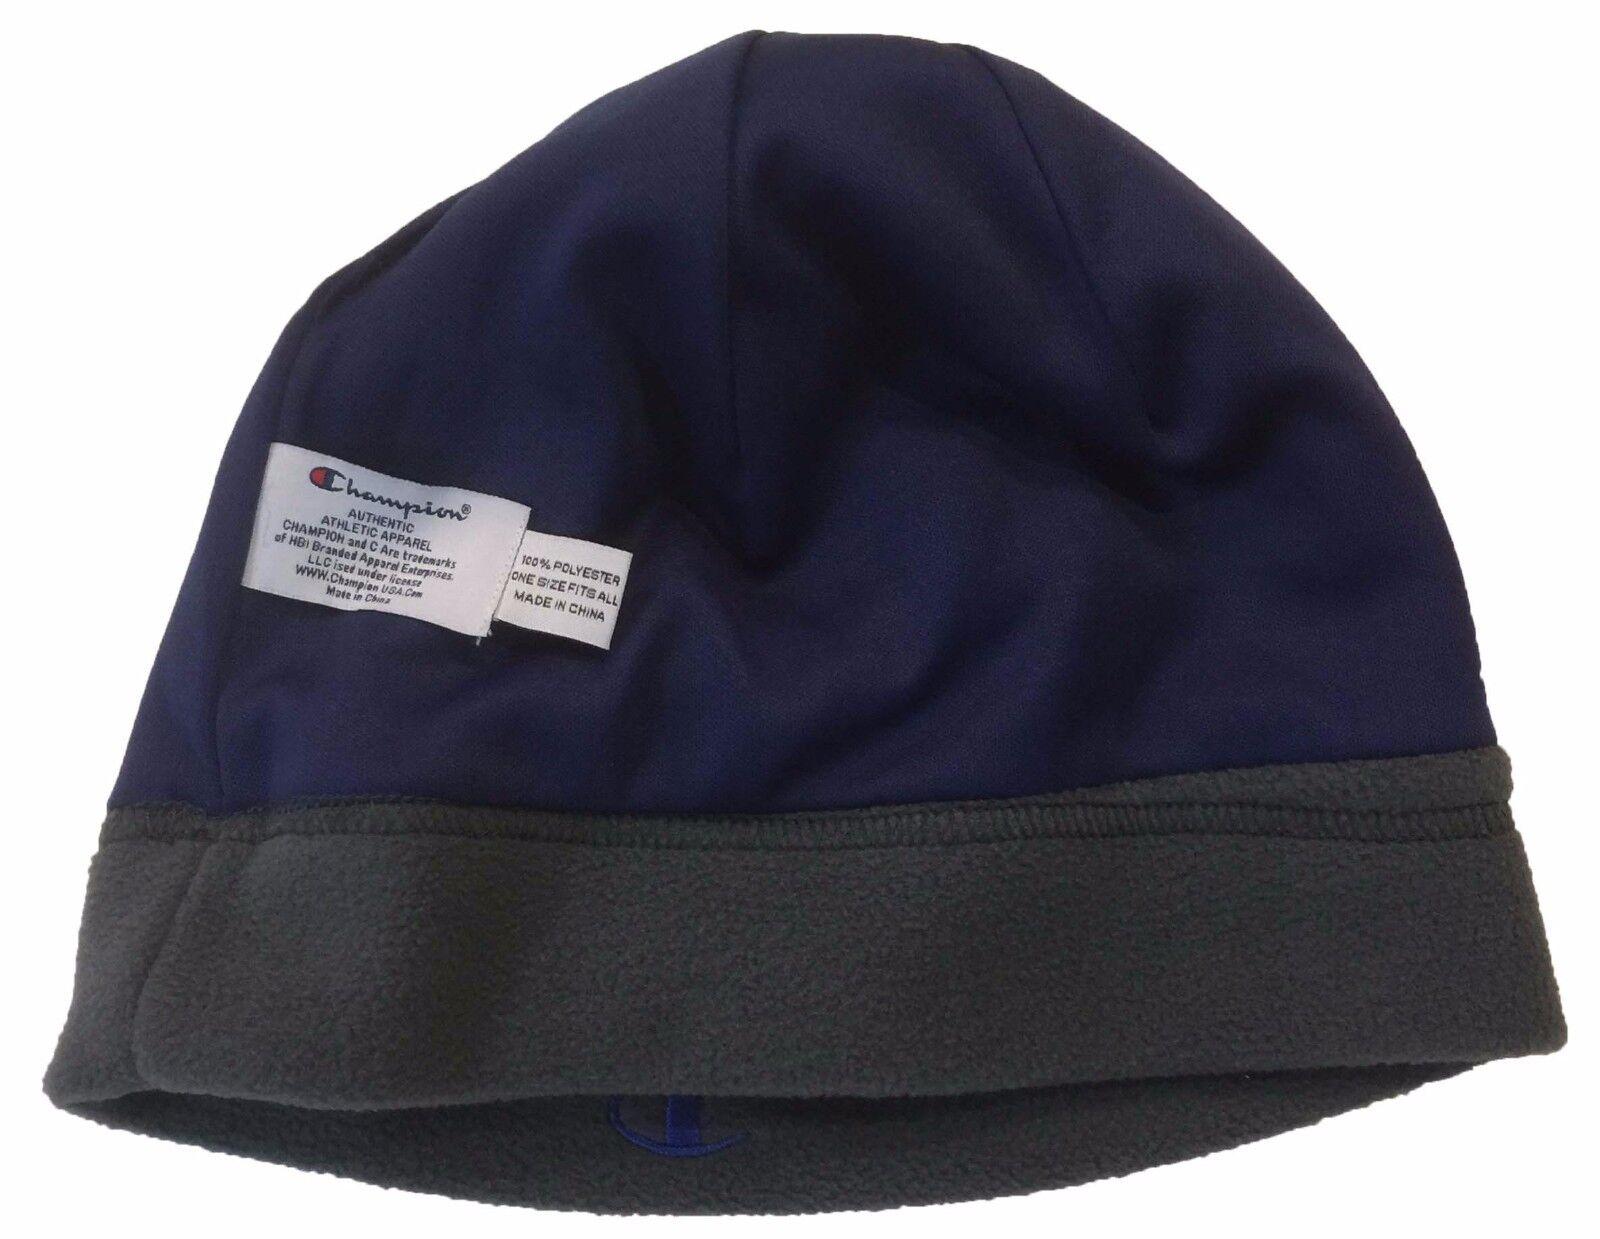 WHOLESALE LOT 2 Name PCS Brand Name 2 Champion Mens Beanie Ski Snowboard Fleece Hat Cap cf9679